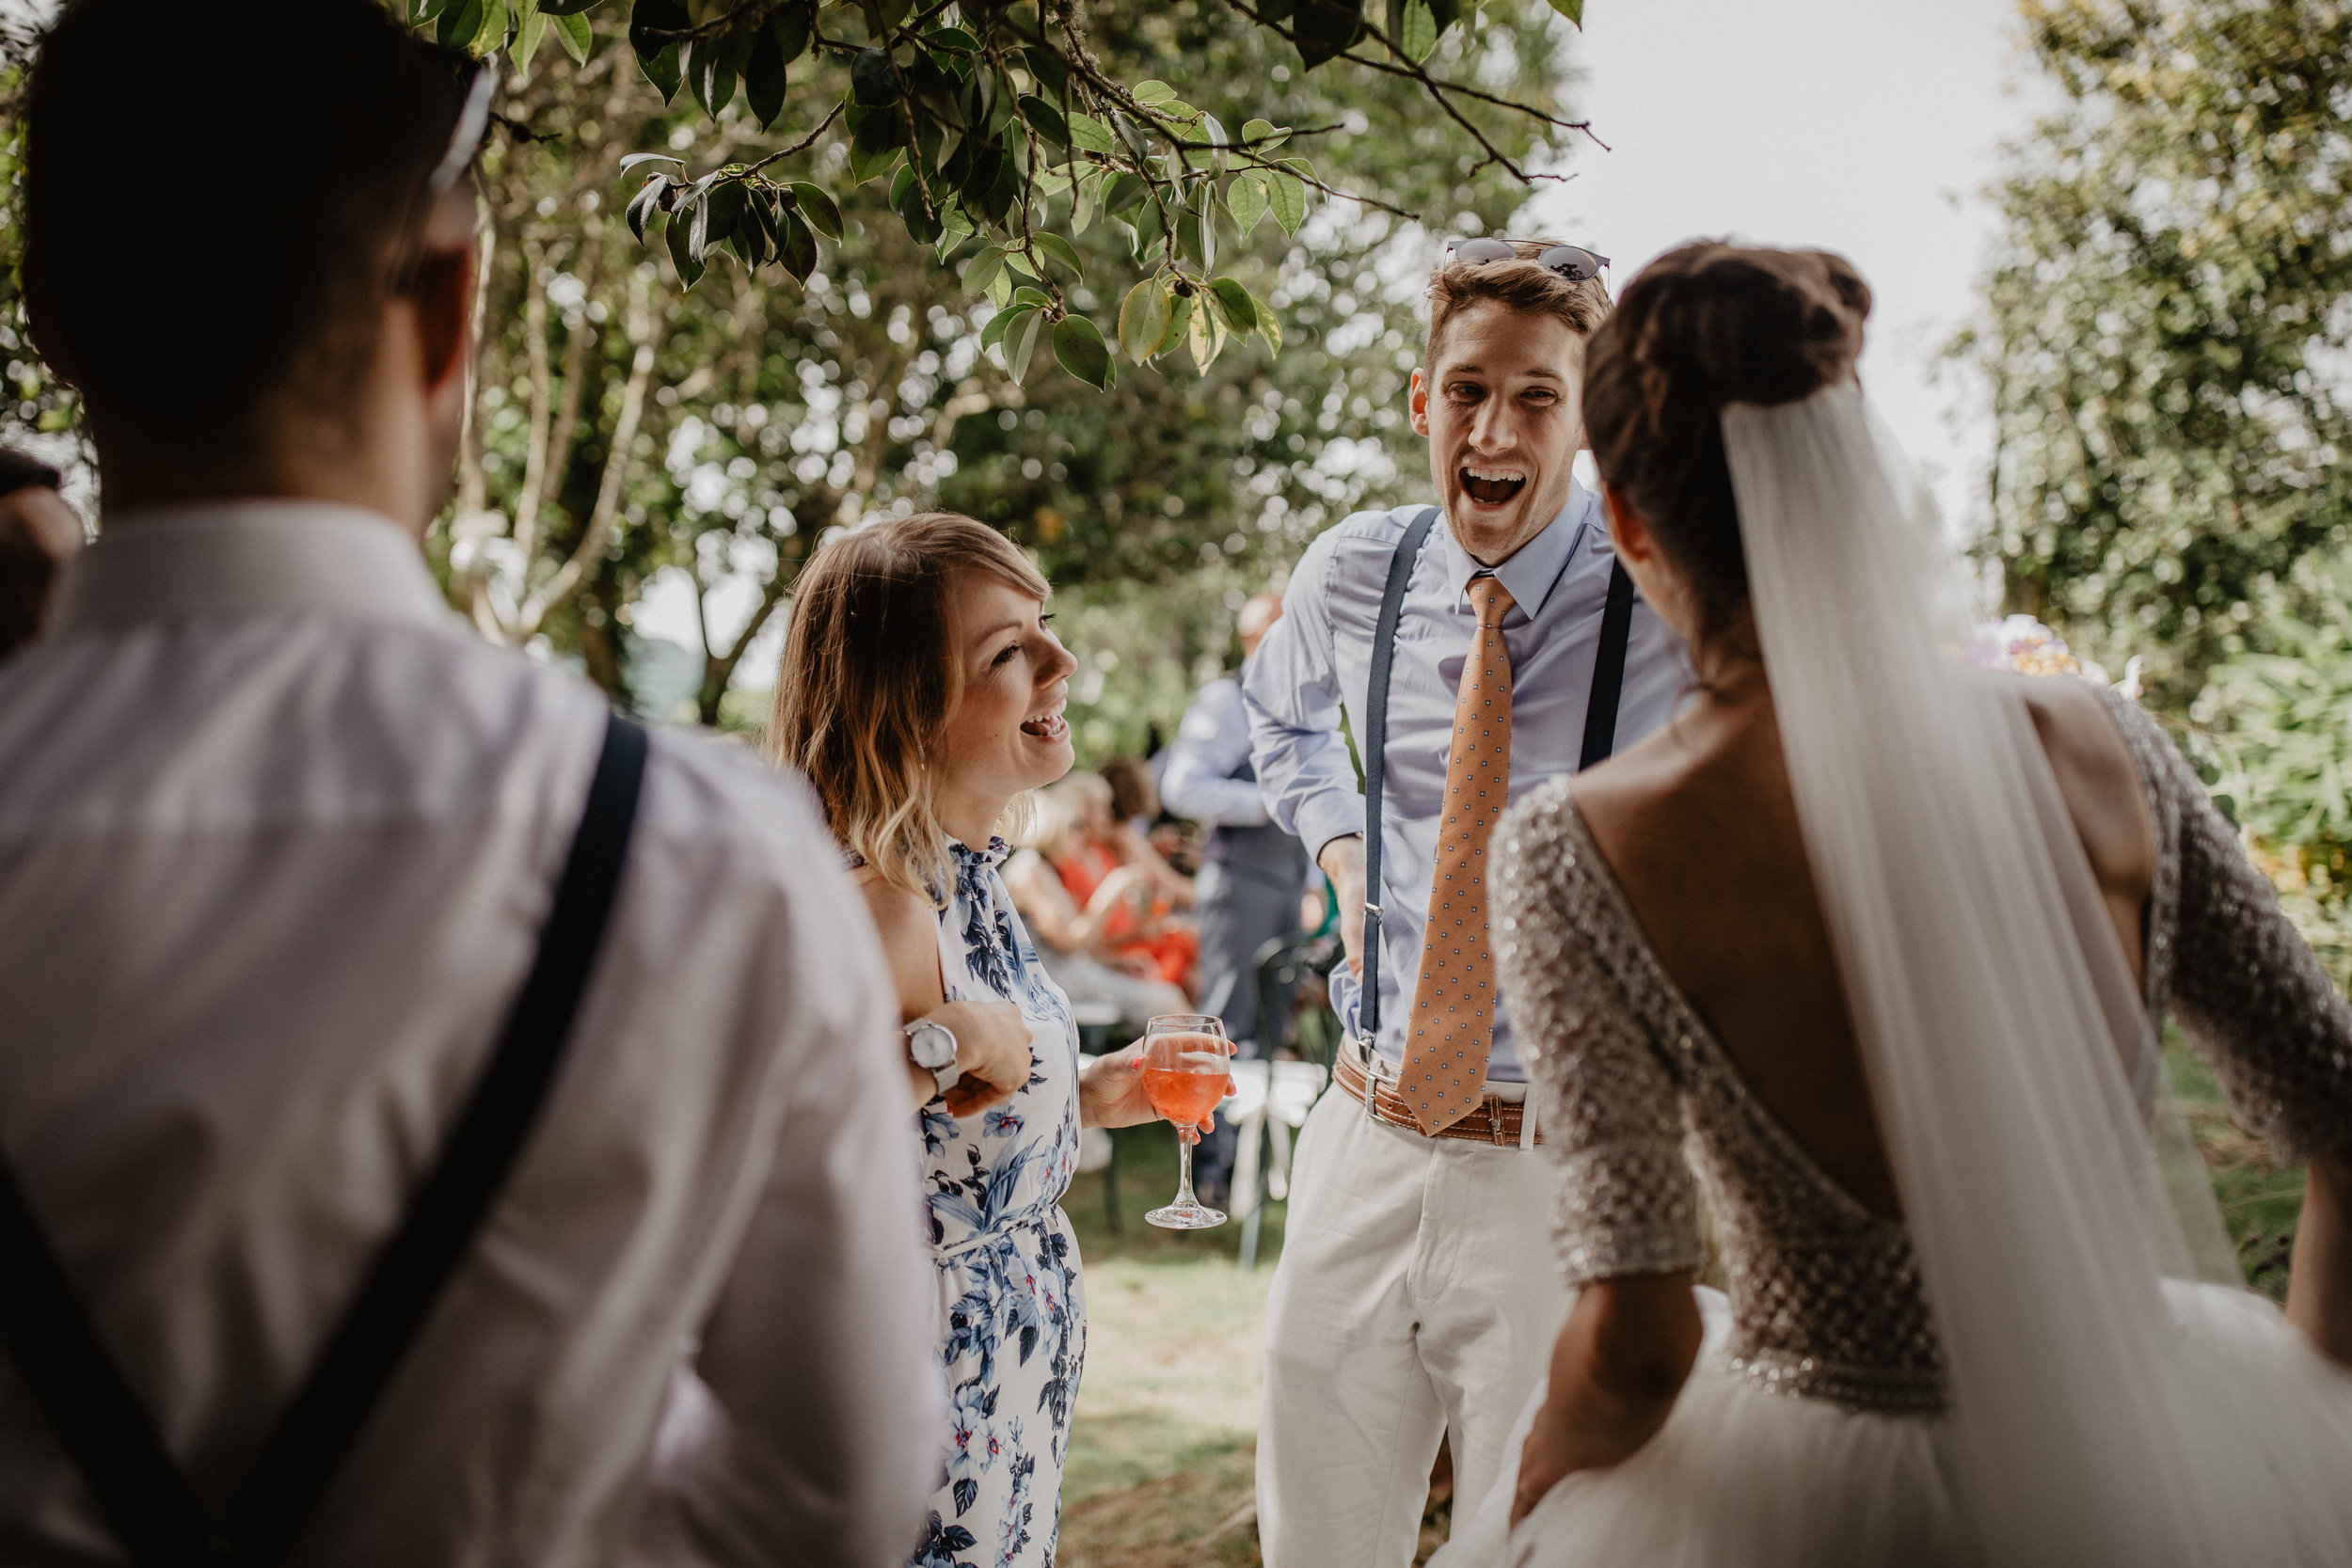 Lapela-photography-wedding-sintra-portugal-80.jpg